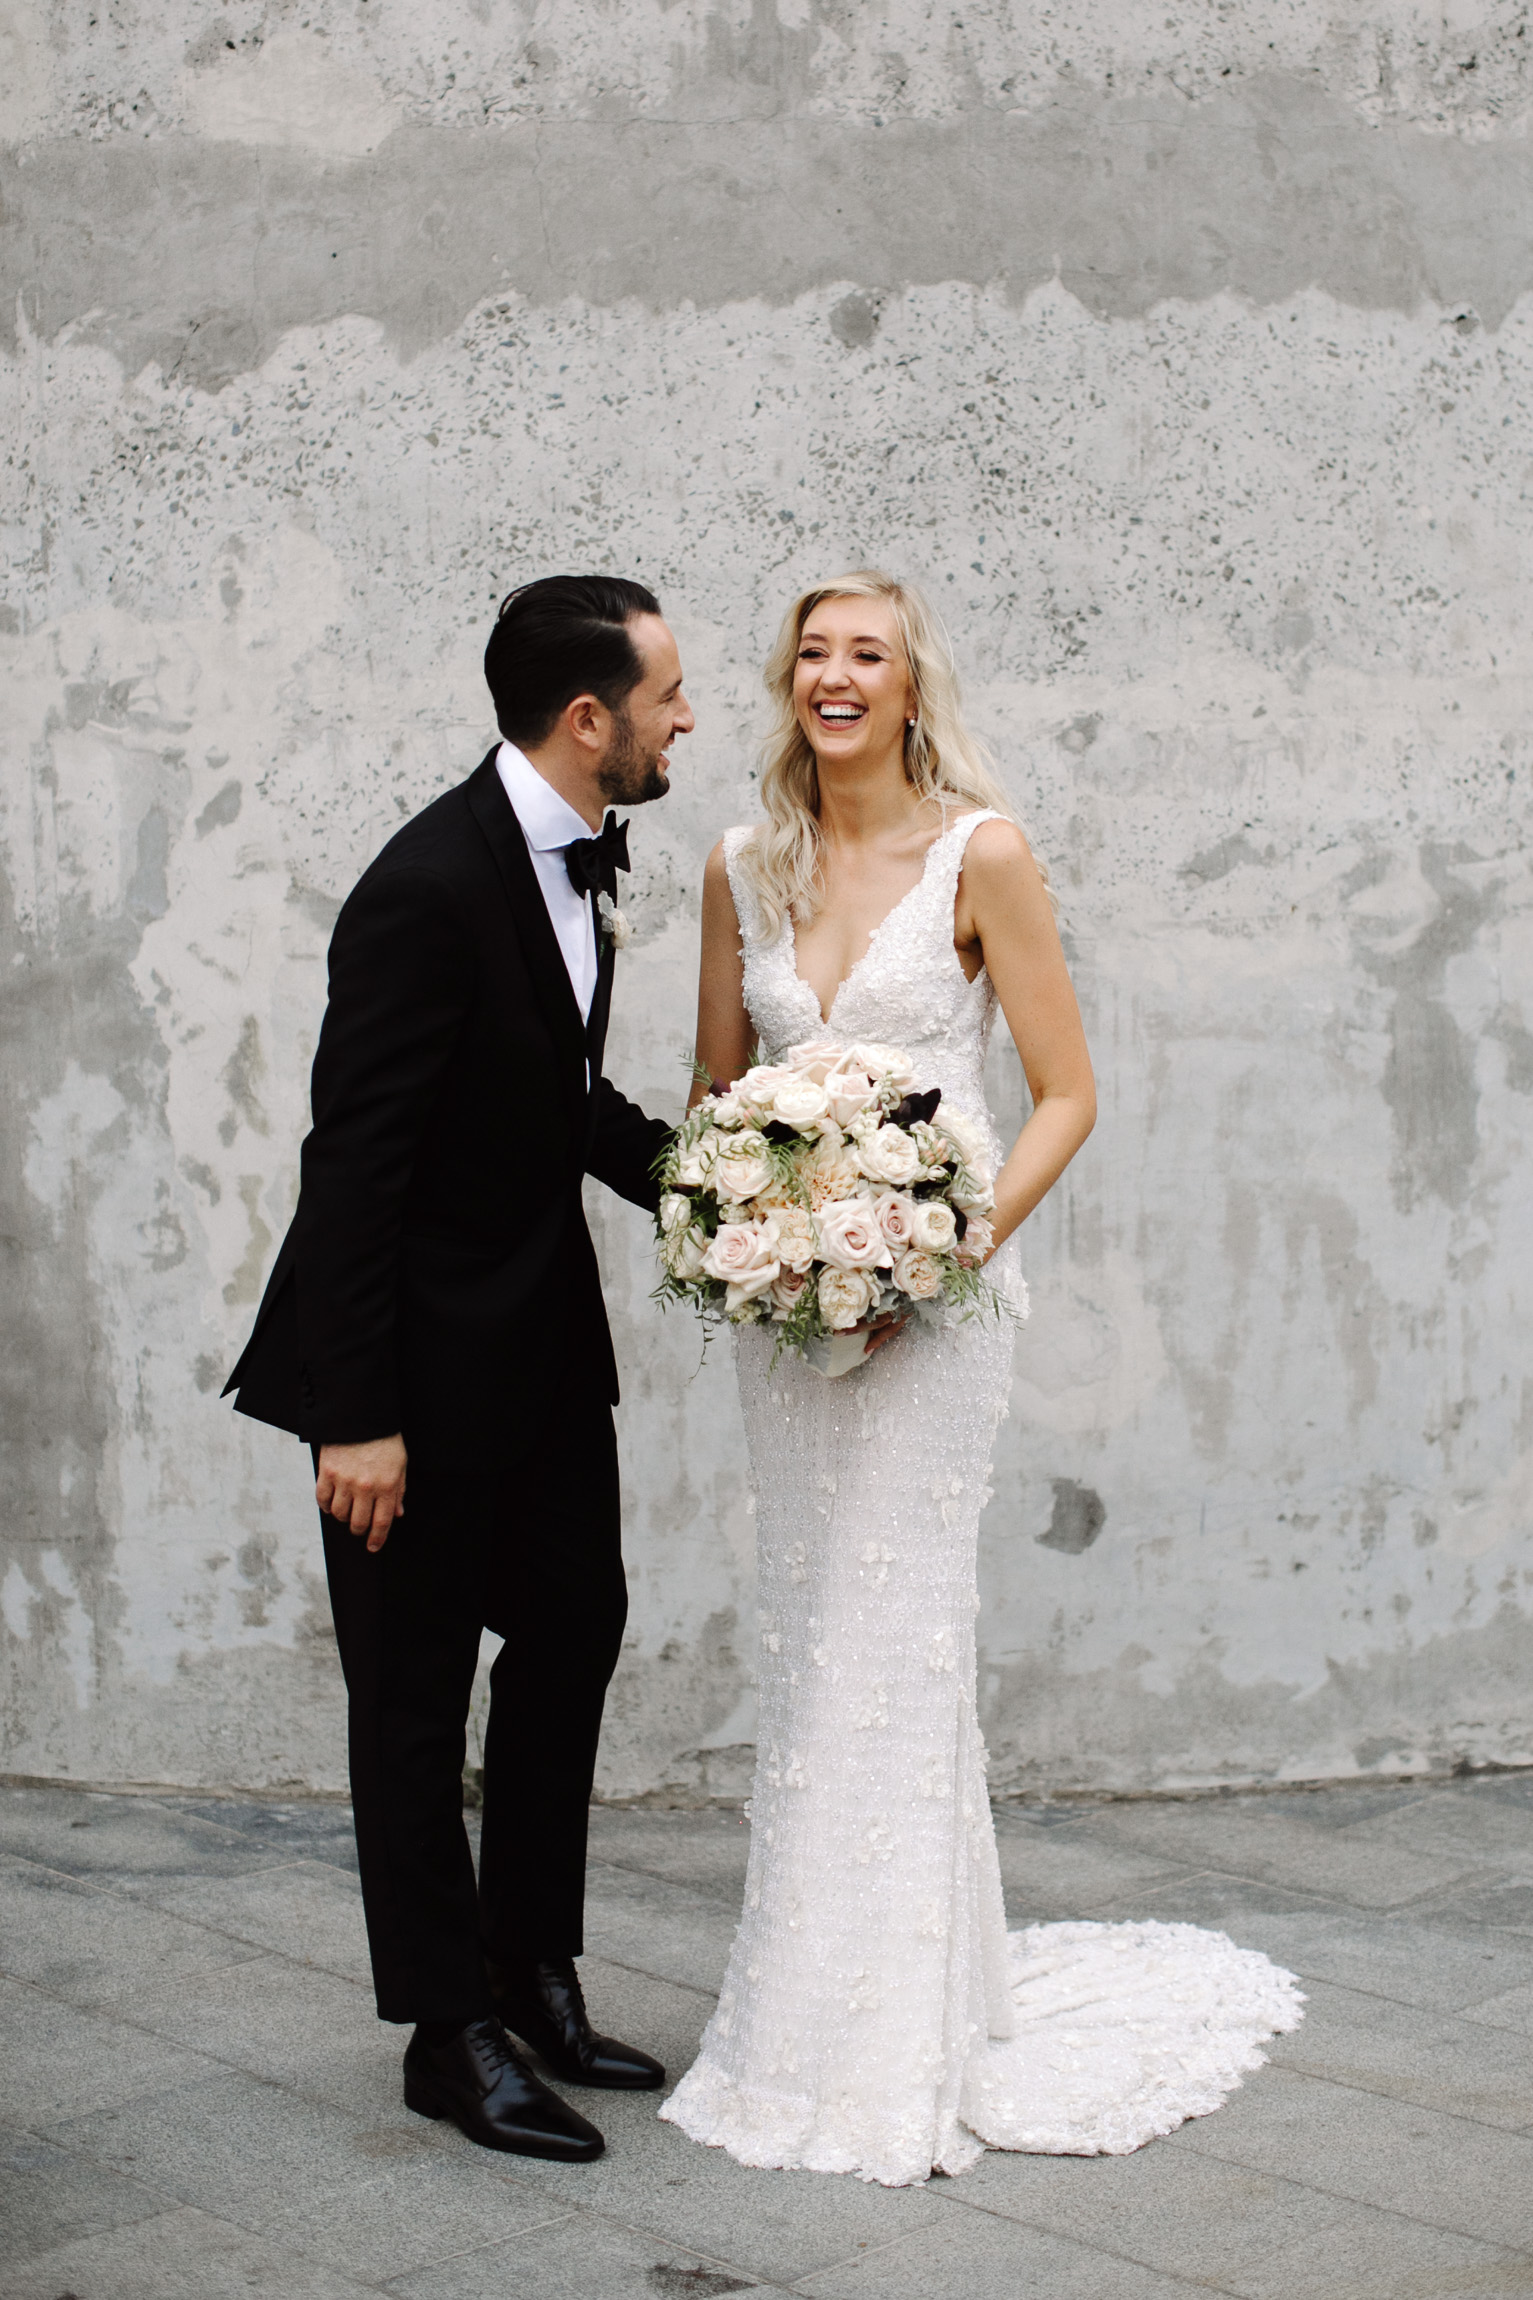 180223_justinaaron_wedding_charlotte_david_h-194.jpg